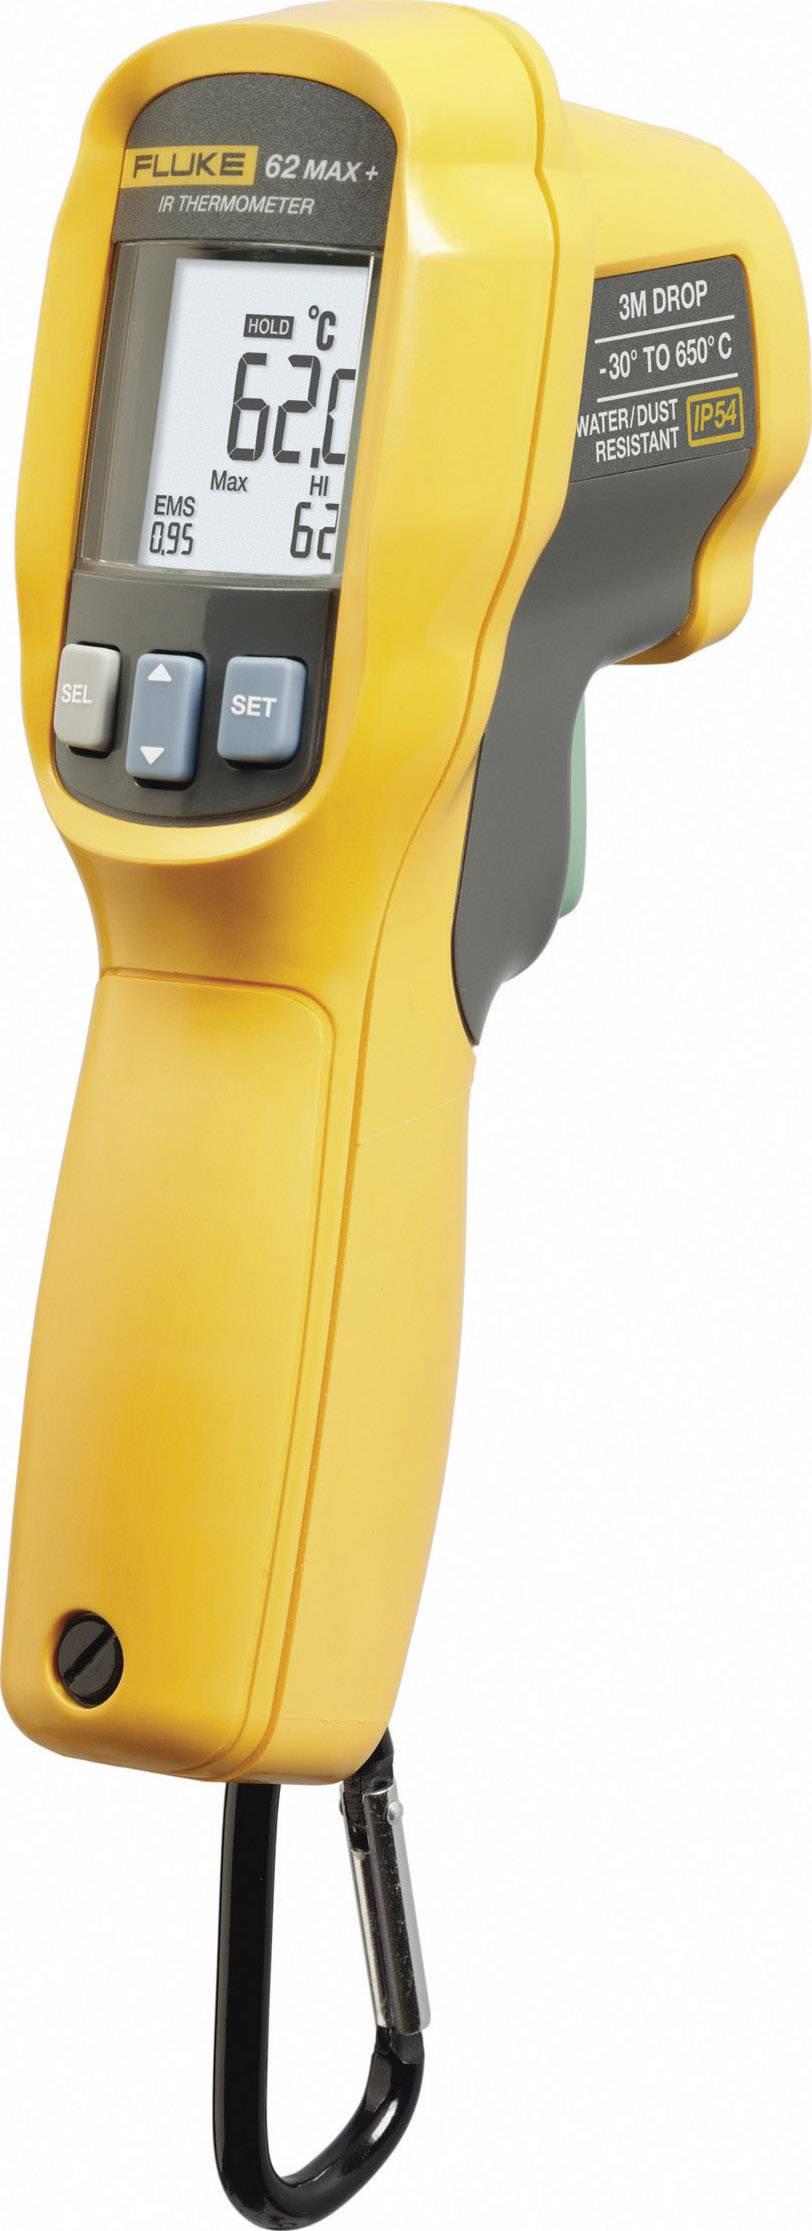 IR teplomer FLUKE-62 MAX PLUS, -30 až +650 °C